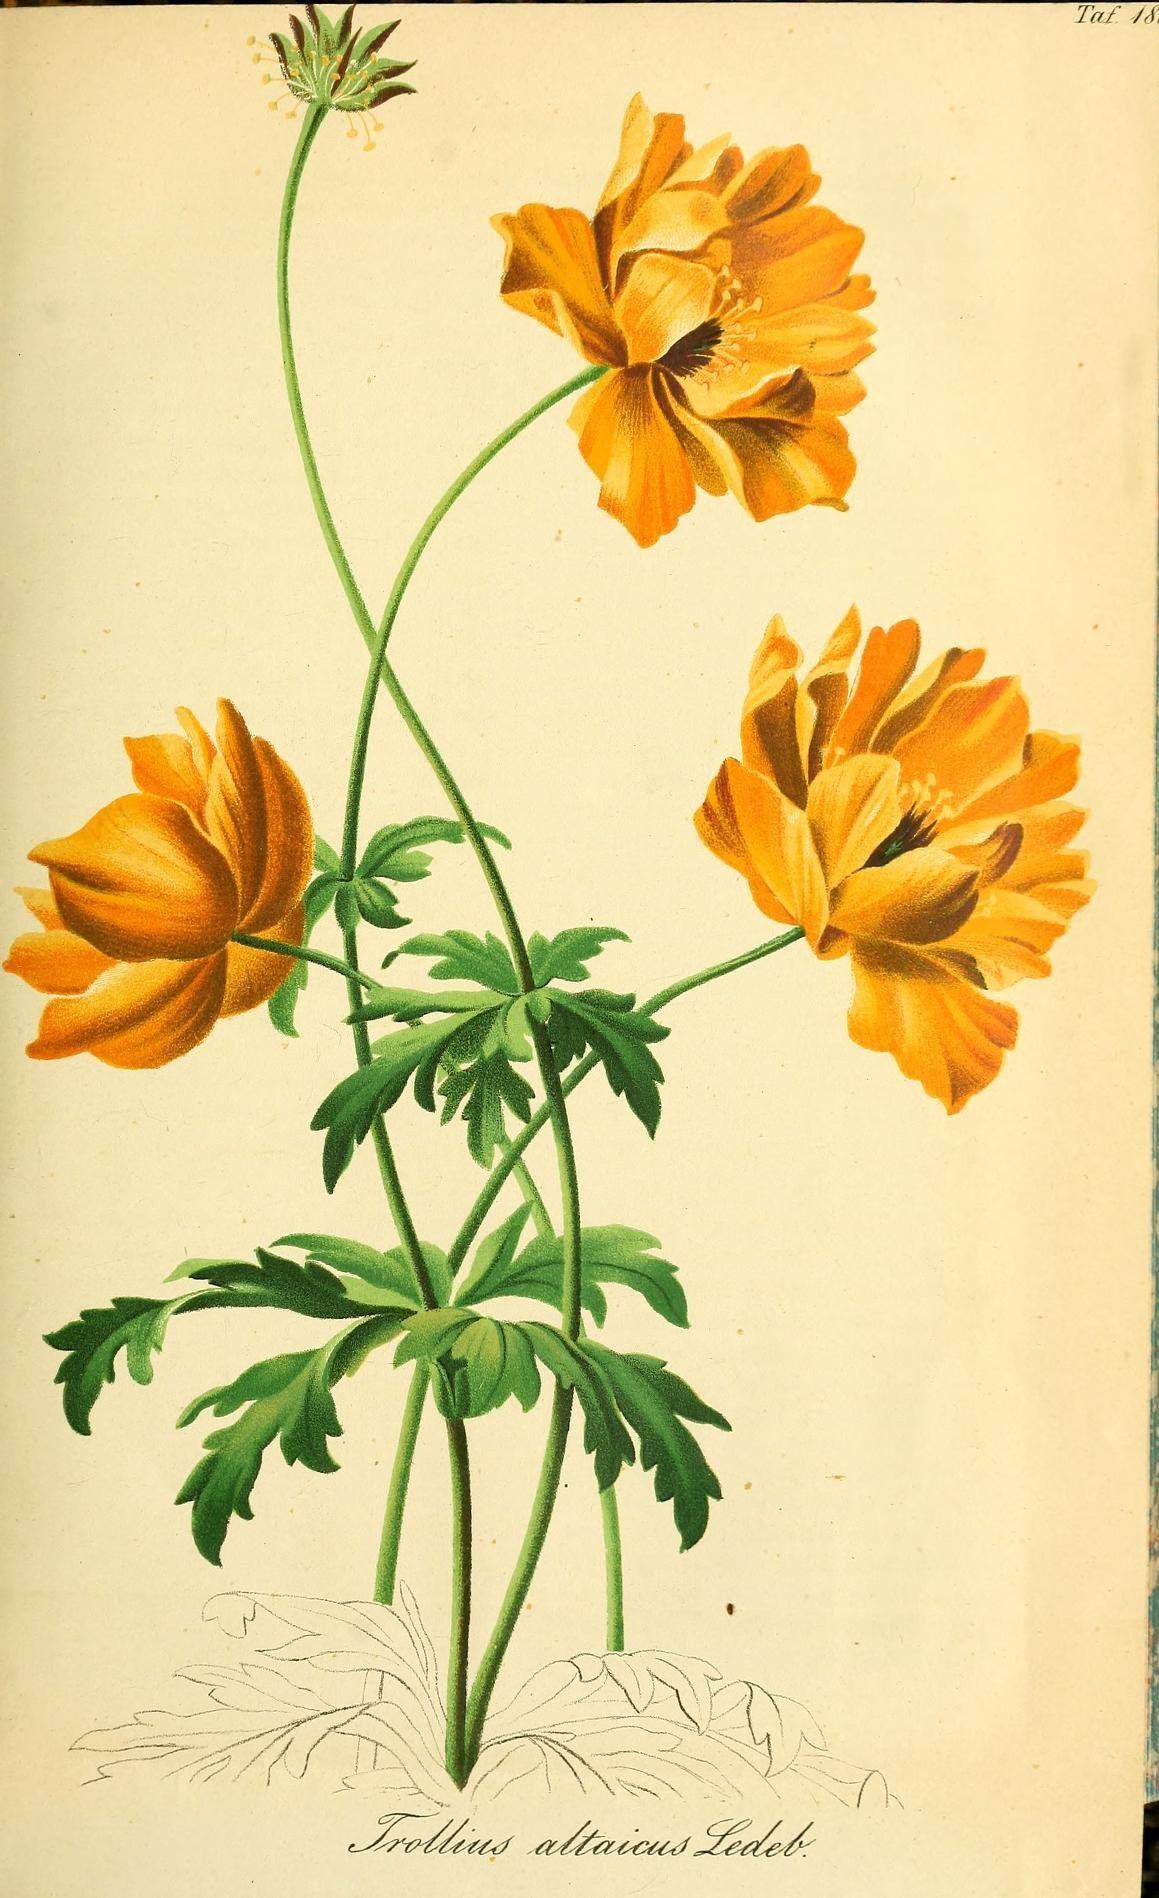 Filegartenflora Taf 188 7535901244jpg Wikimedia Commons